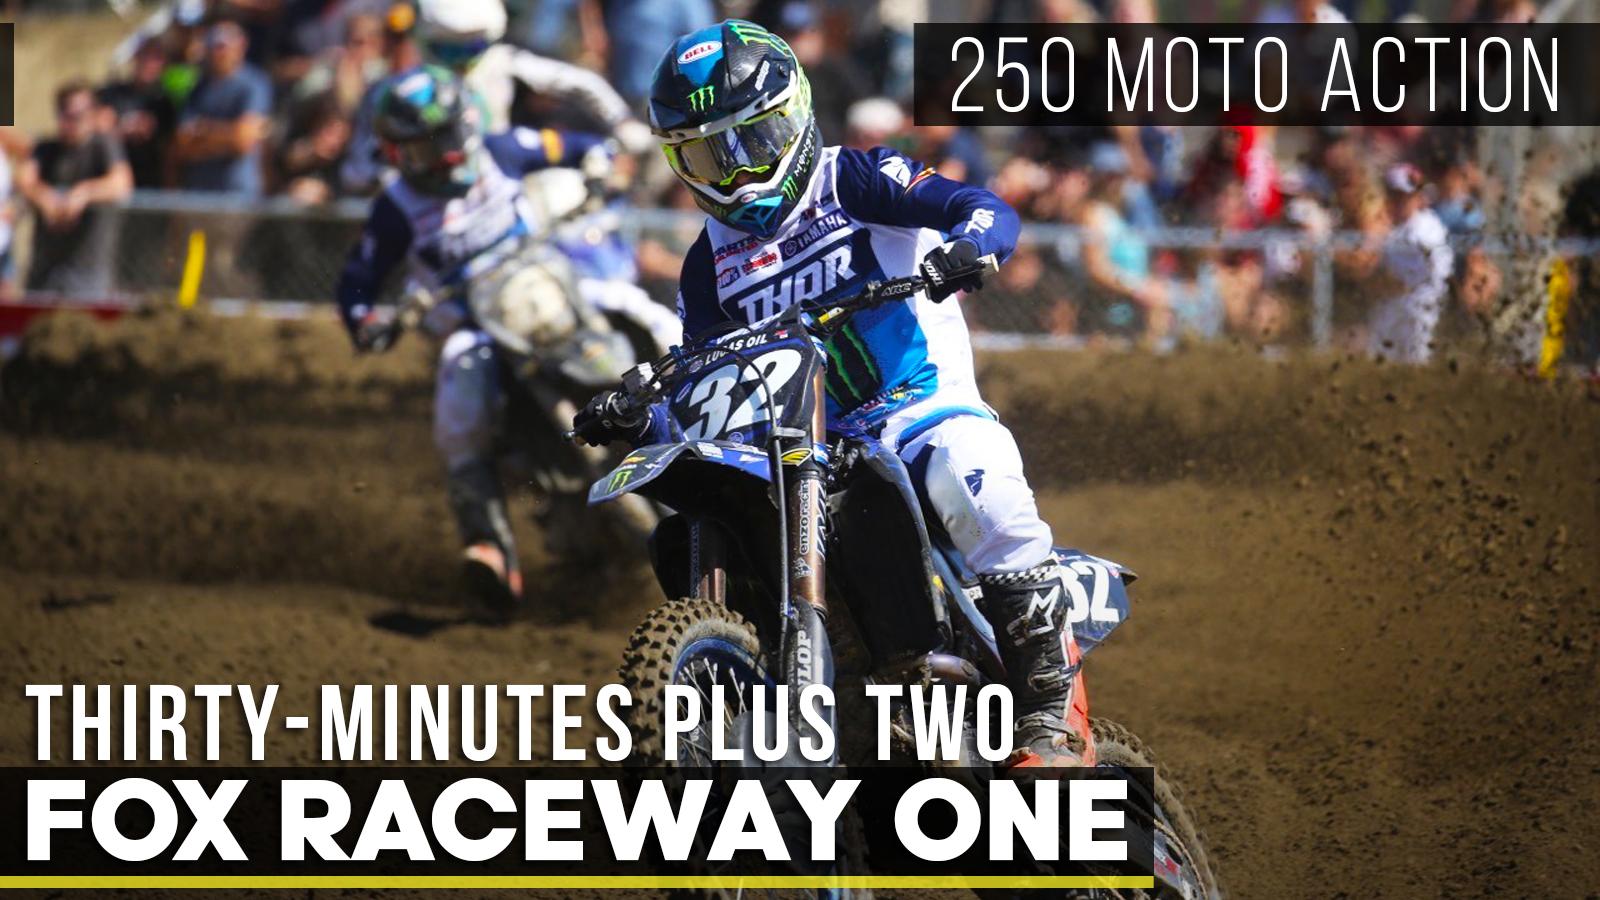 Thirty-Minutes Plus Two   250 Moto Action